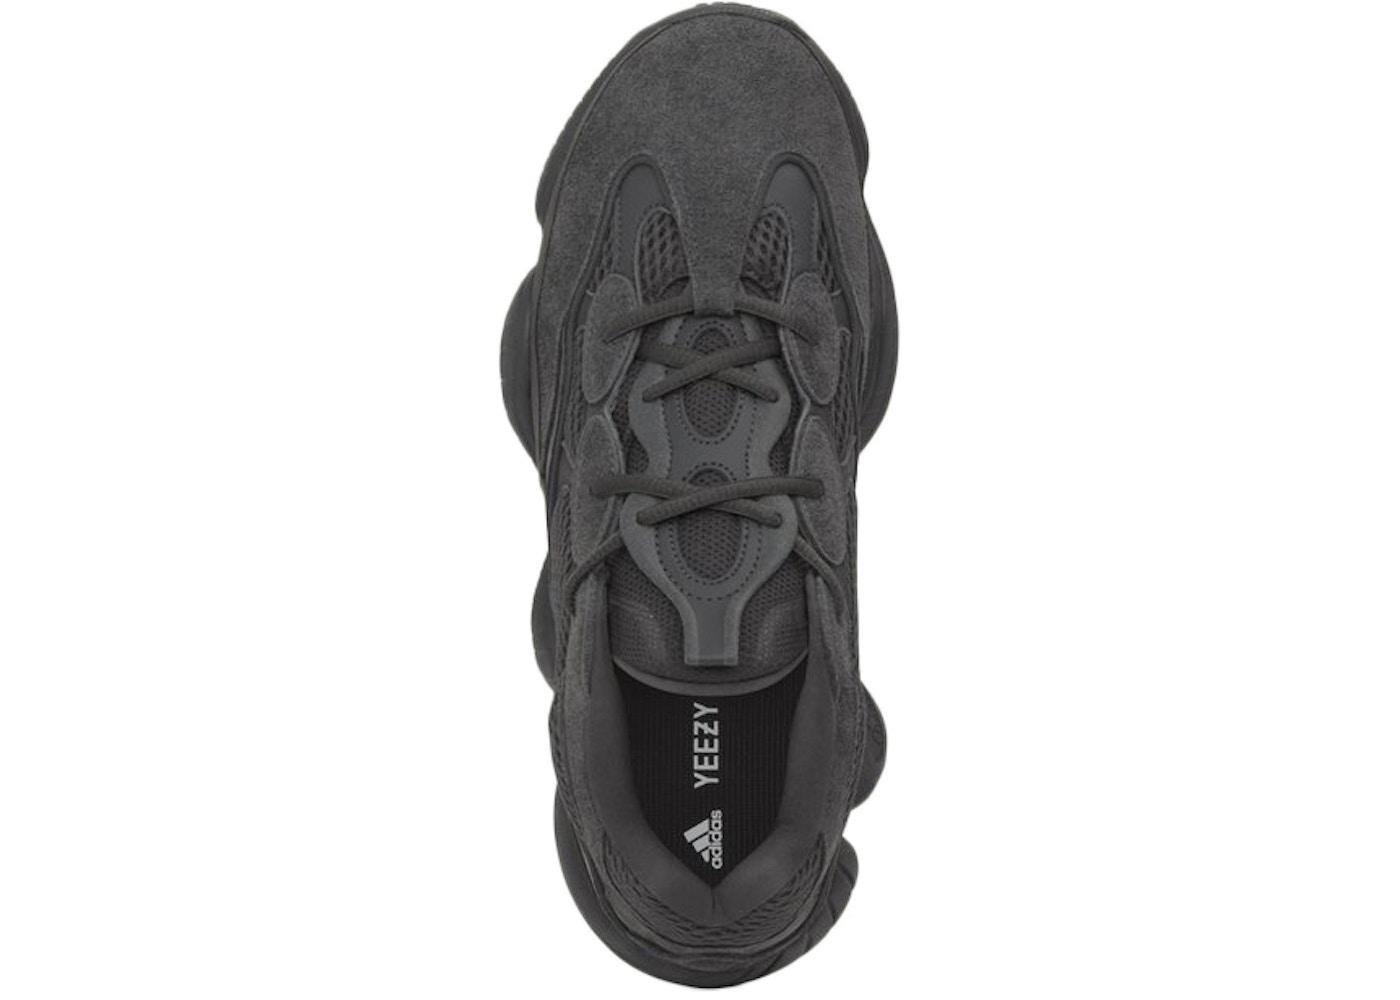 f8f49e959 adidas Yeezy 500 Utility Black - F36640